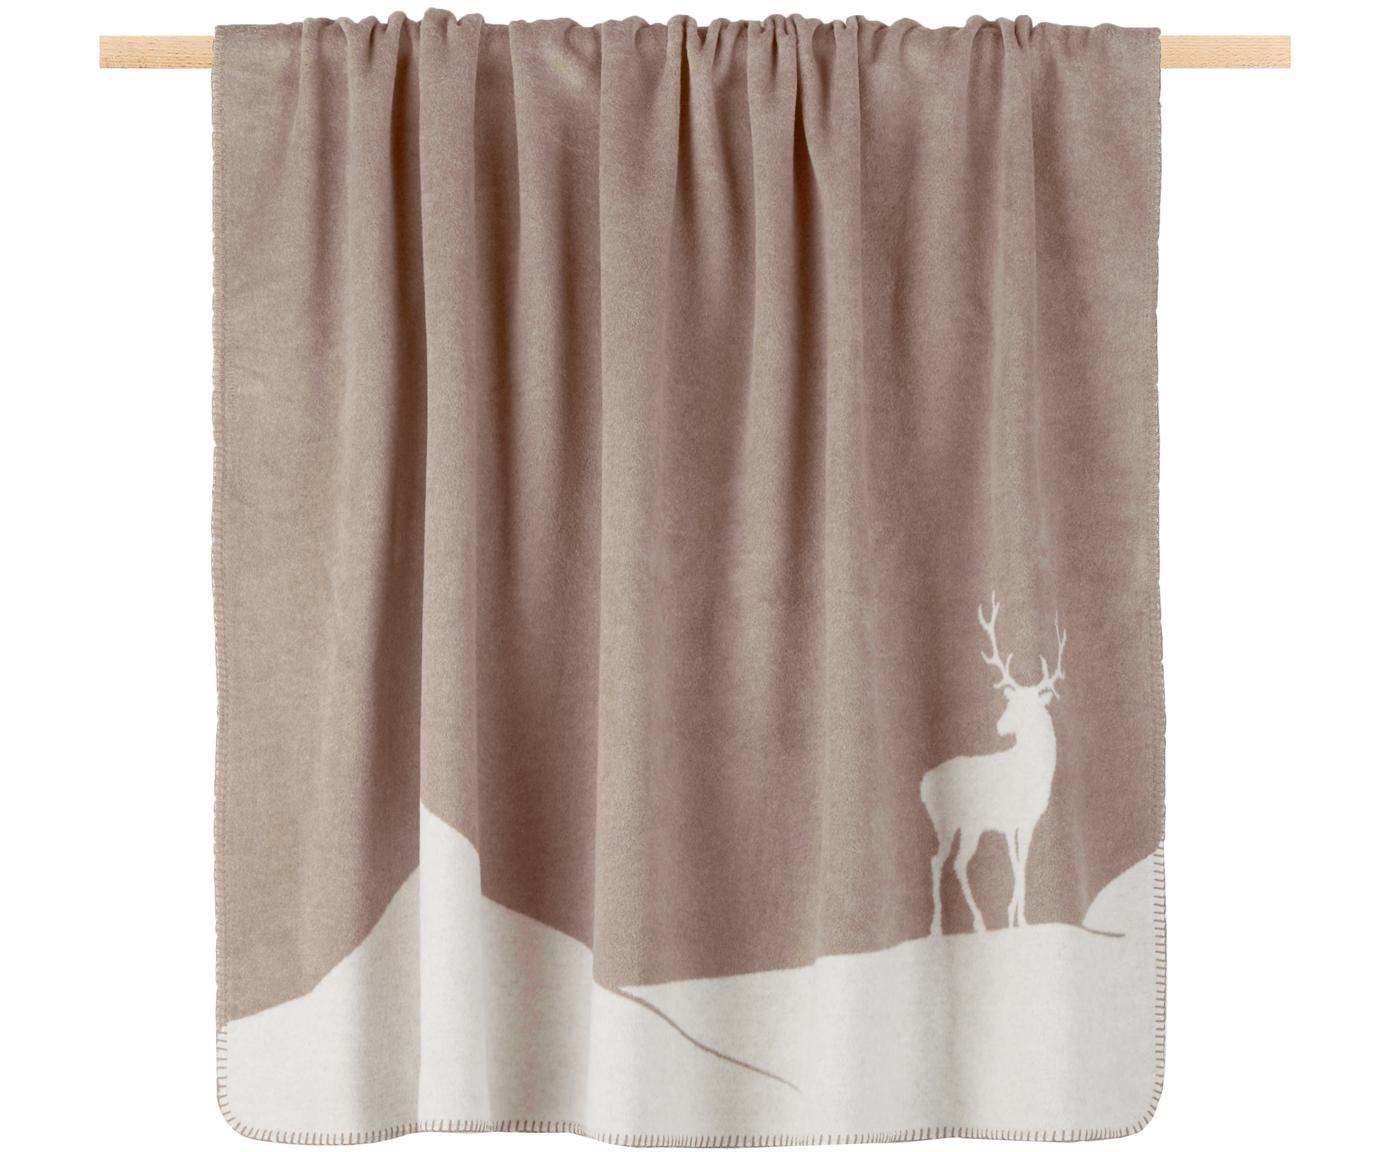 Plaid reversibile in pile con cervo Savona Hirsch, Tessuto: Jacquard, Beige, bianco, Larg. 150 x Lung. 200 cm